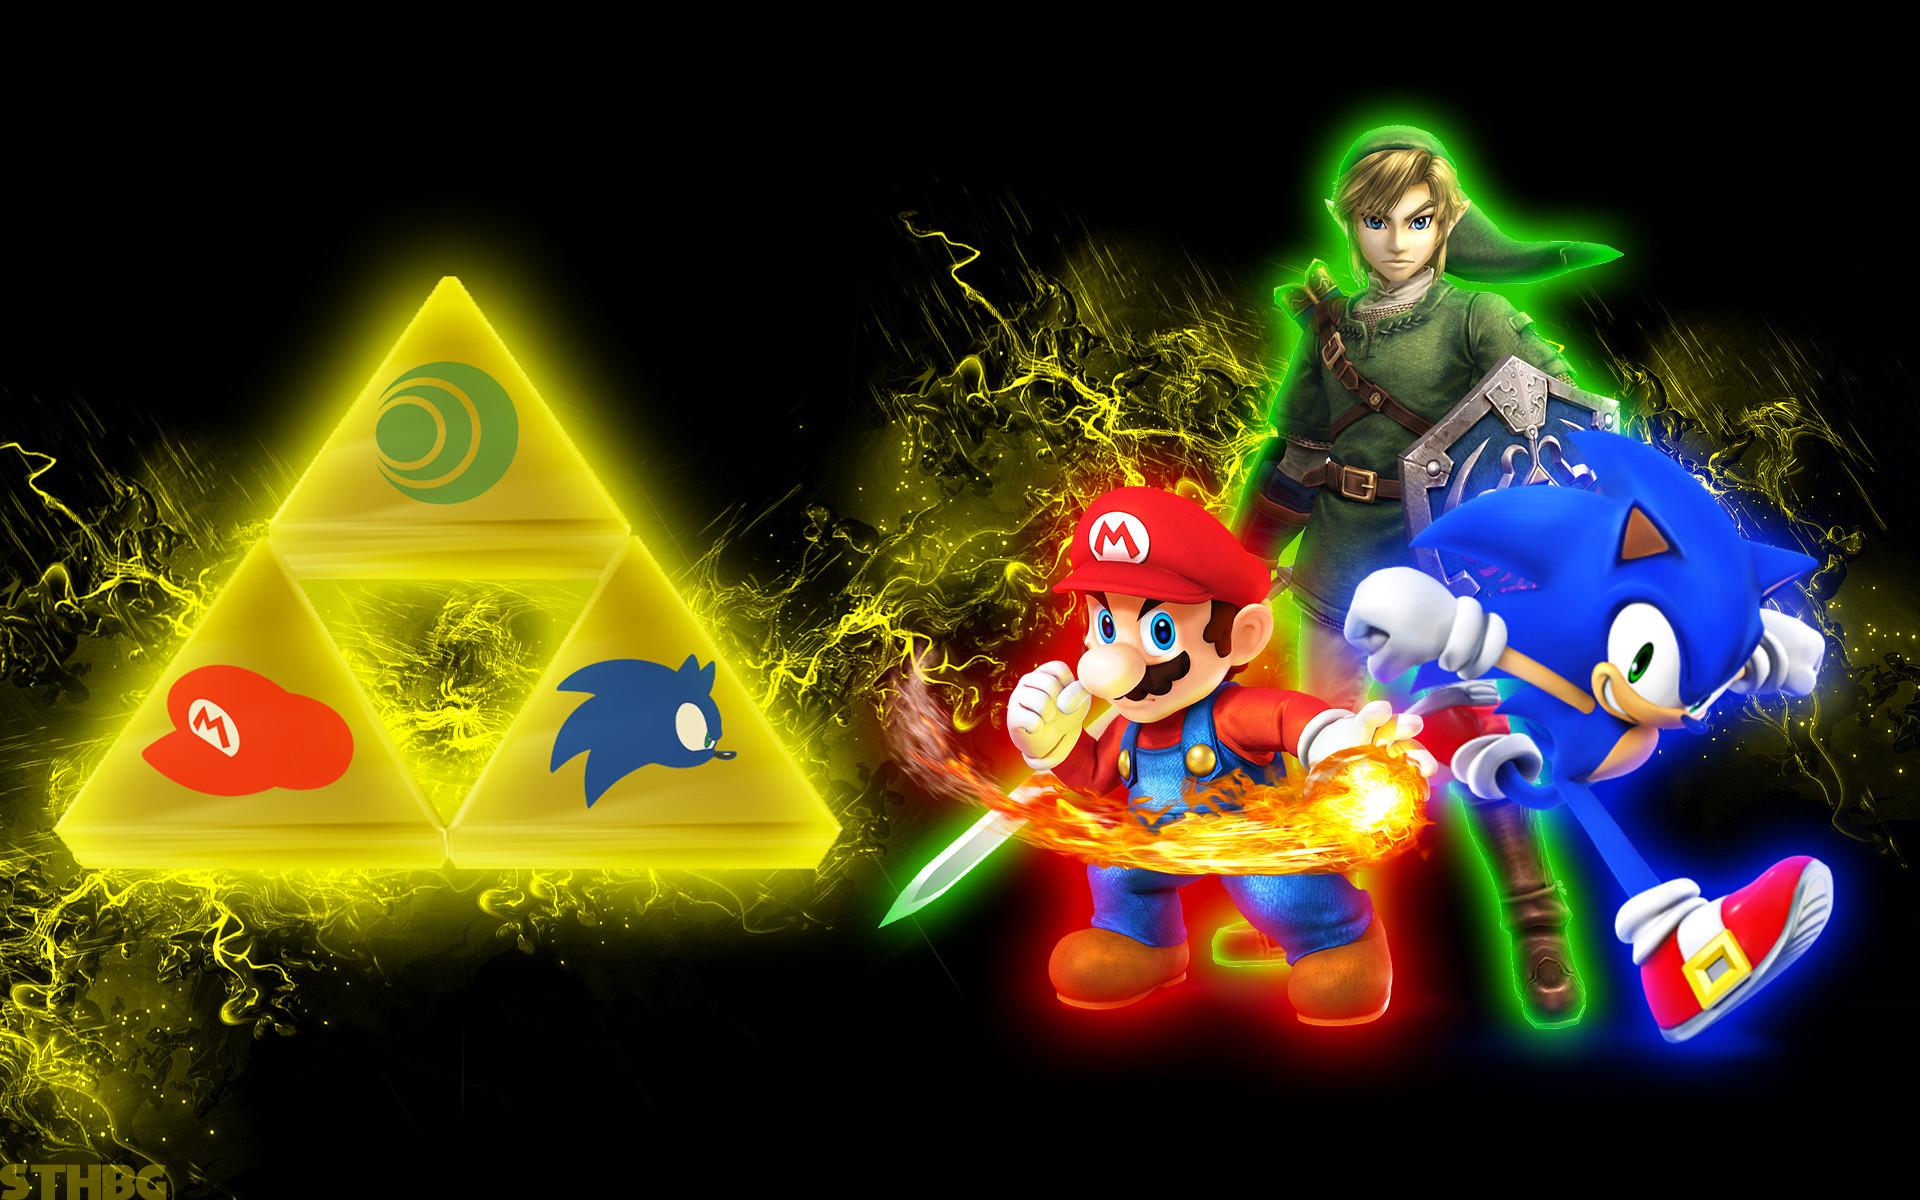 … SonicTheHedgehogBG Link,Mario And Sonic – Wallpaper by  SonicTheHedgehogBG